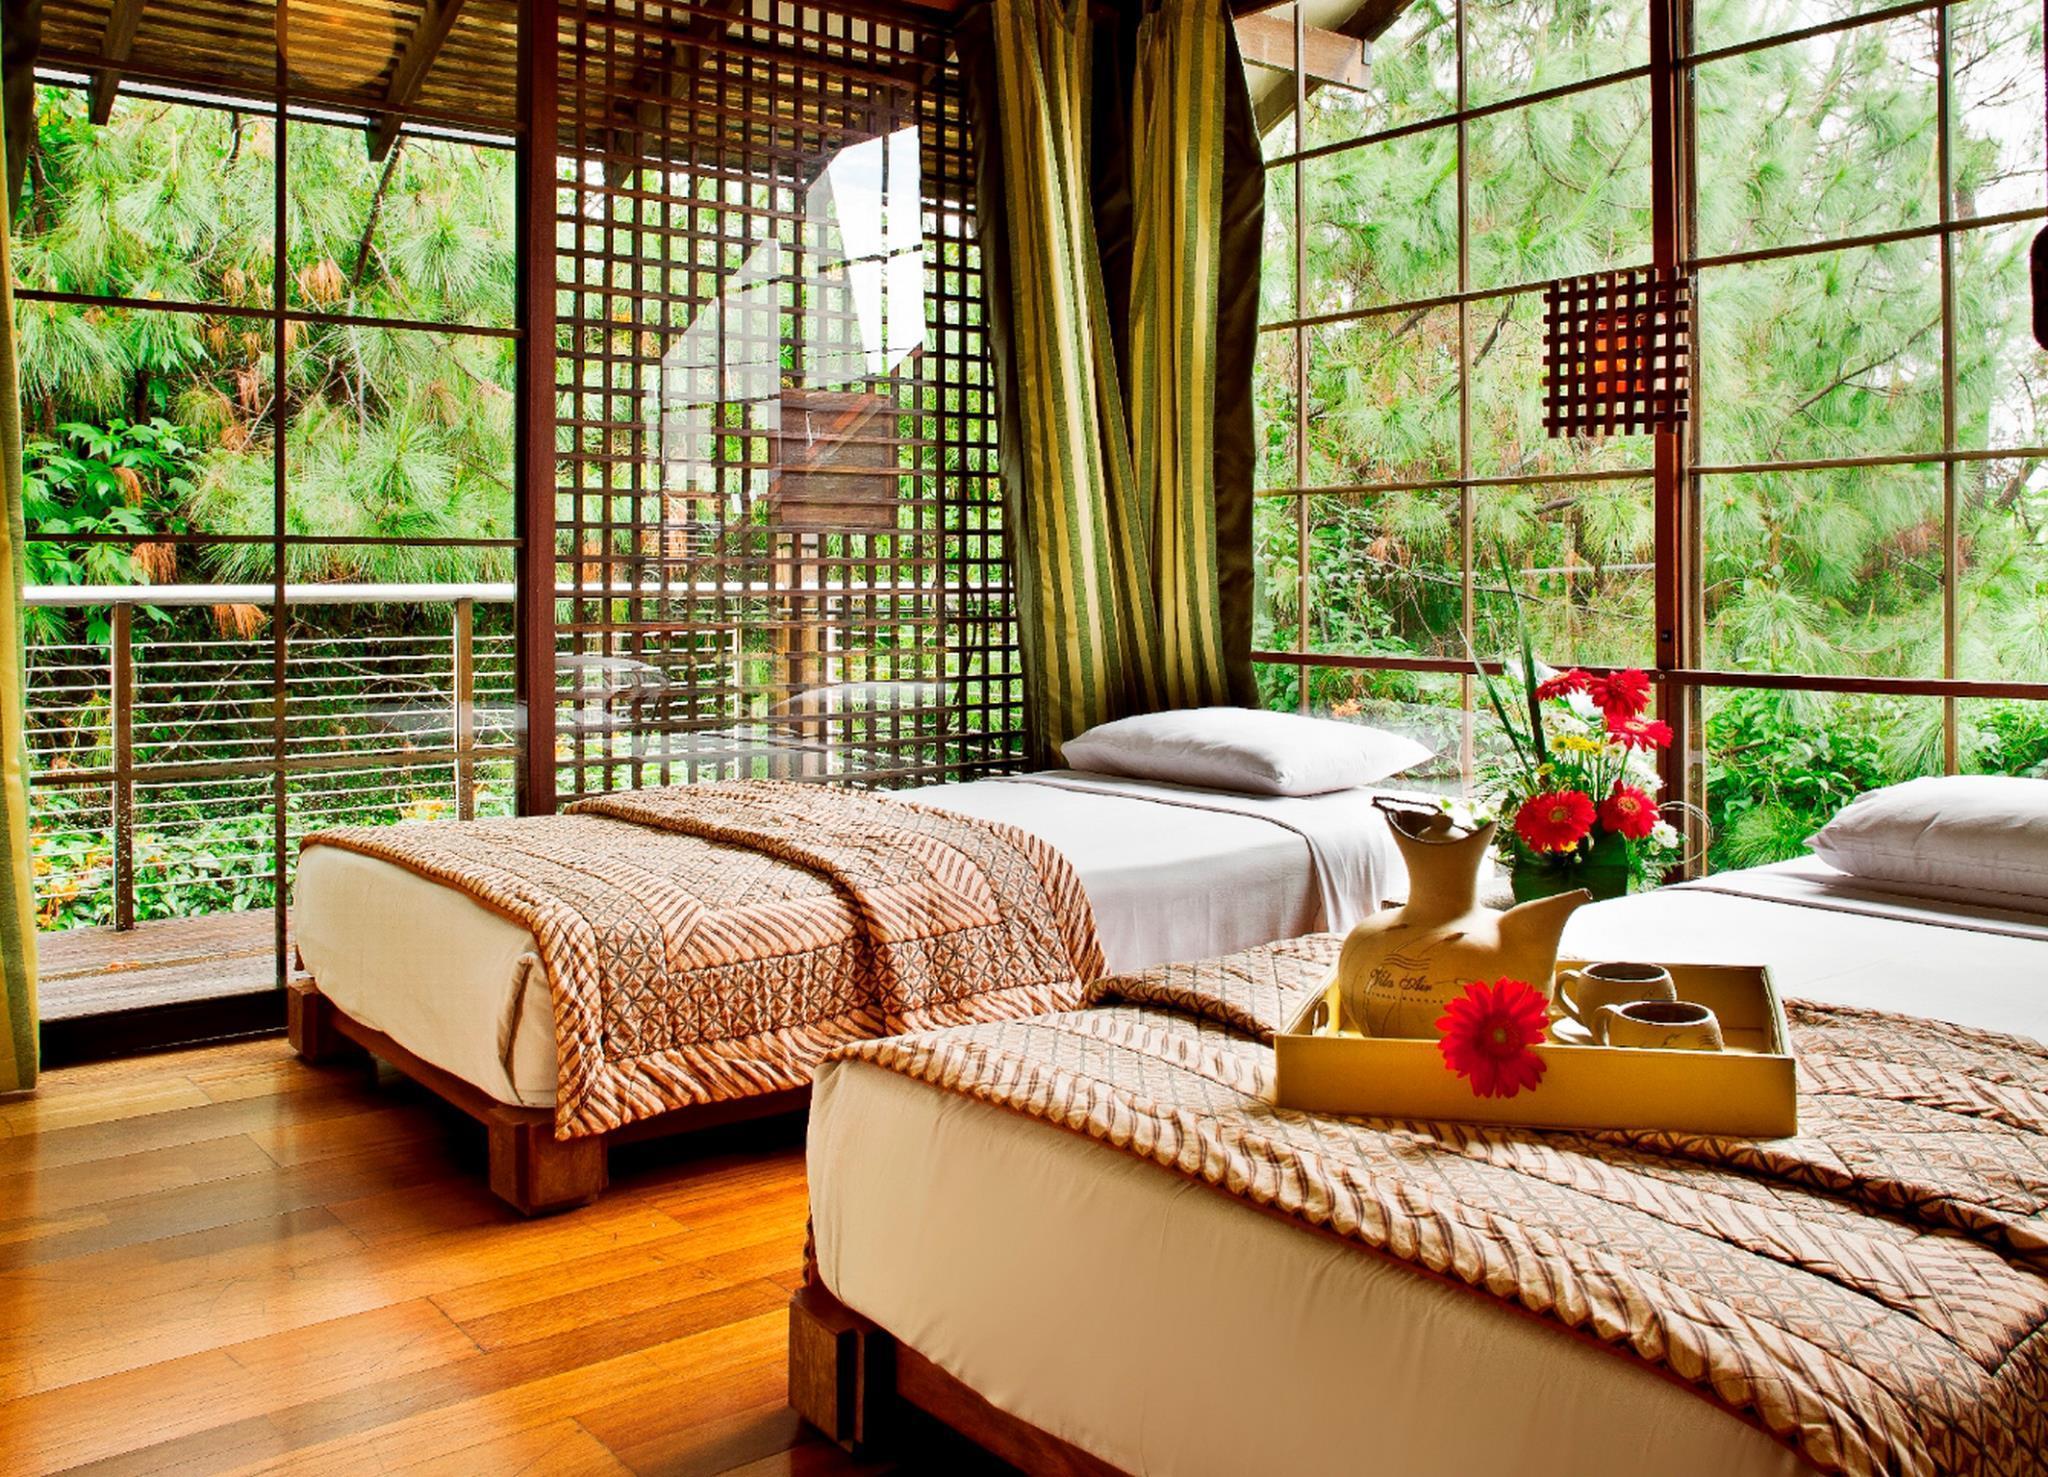 Vila Air Natural Resort Lembang Bandung | PROMO TERBARU ...